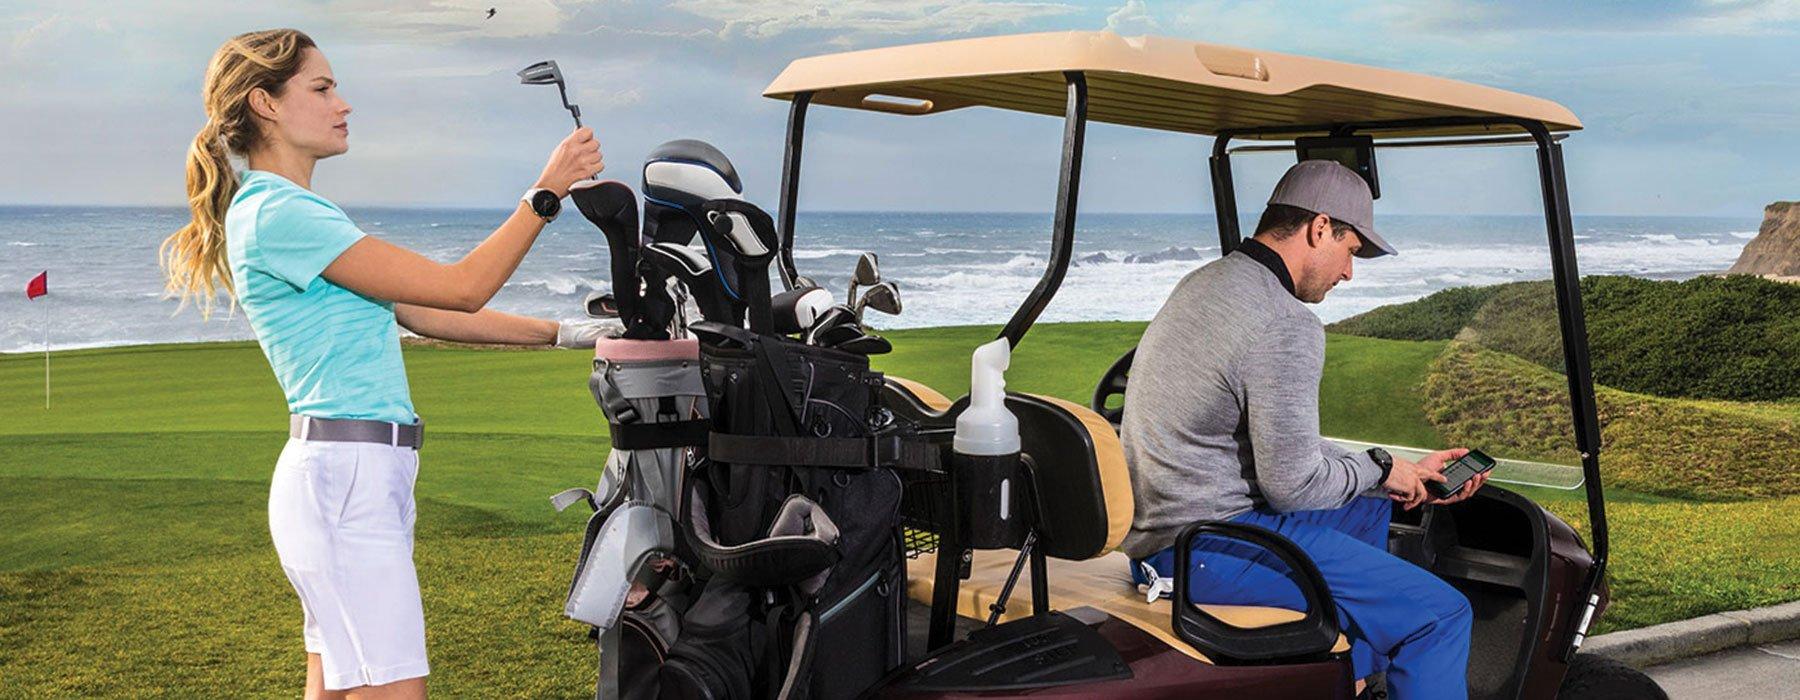 Garmin Golf™ App - A man and woman golfing